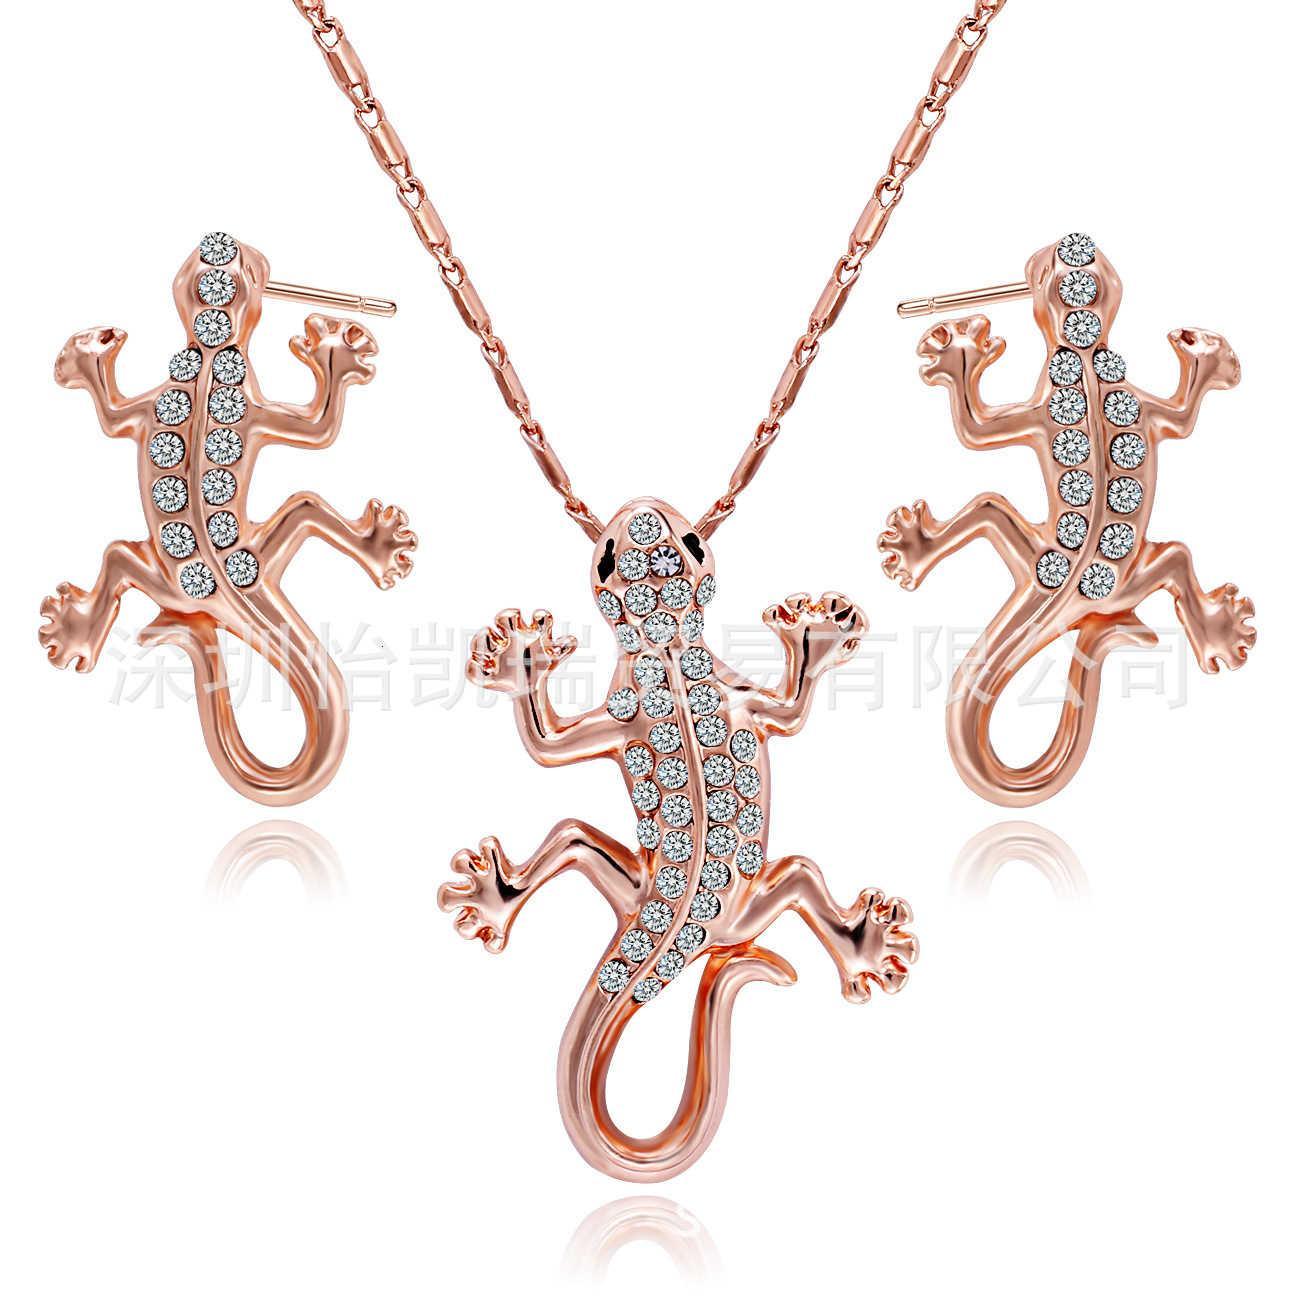 South Korean Animal Lizard Jewelry Women's Full Diamond Alloy Gecko Necklace Earring Set